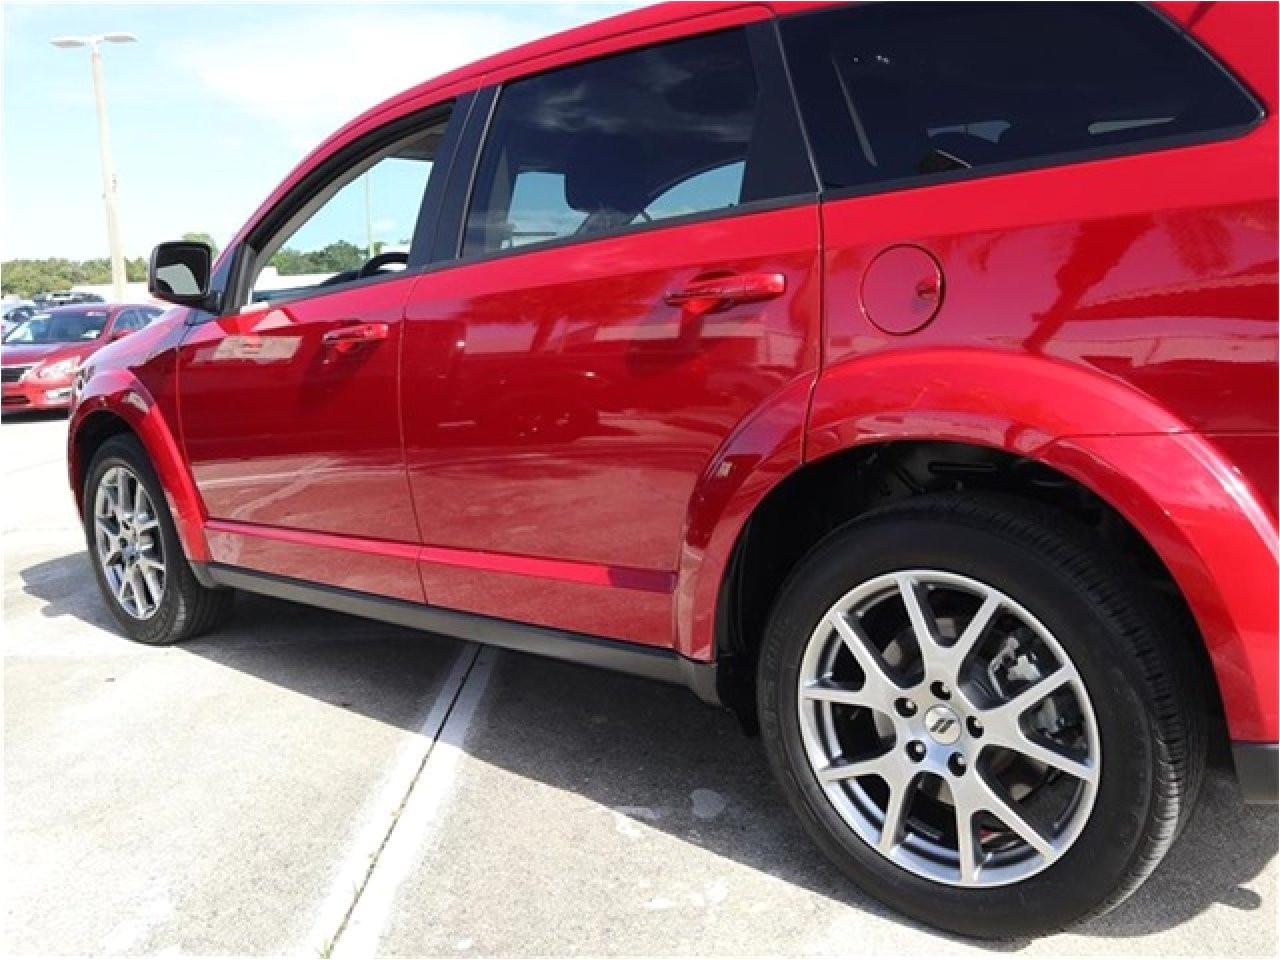 Used Tire Shop Venice Fl 2018 Dodge Journey Gt 3c4pdceg9jt362679 Nissan Of Venice Venice Fl